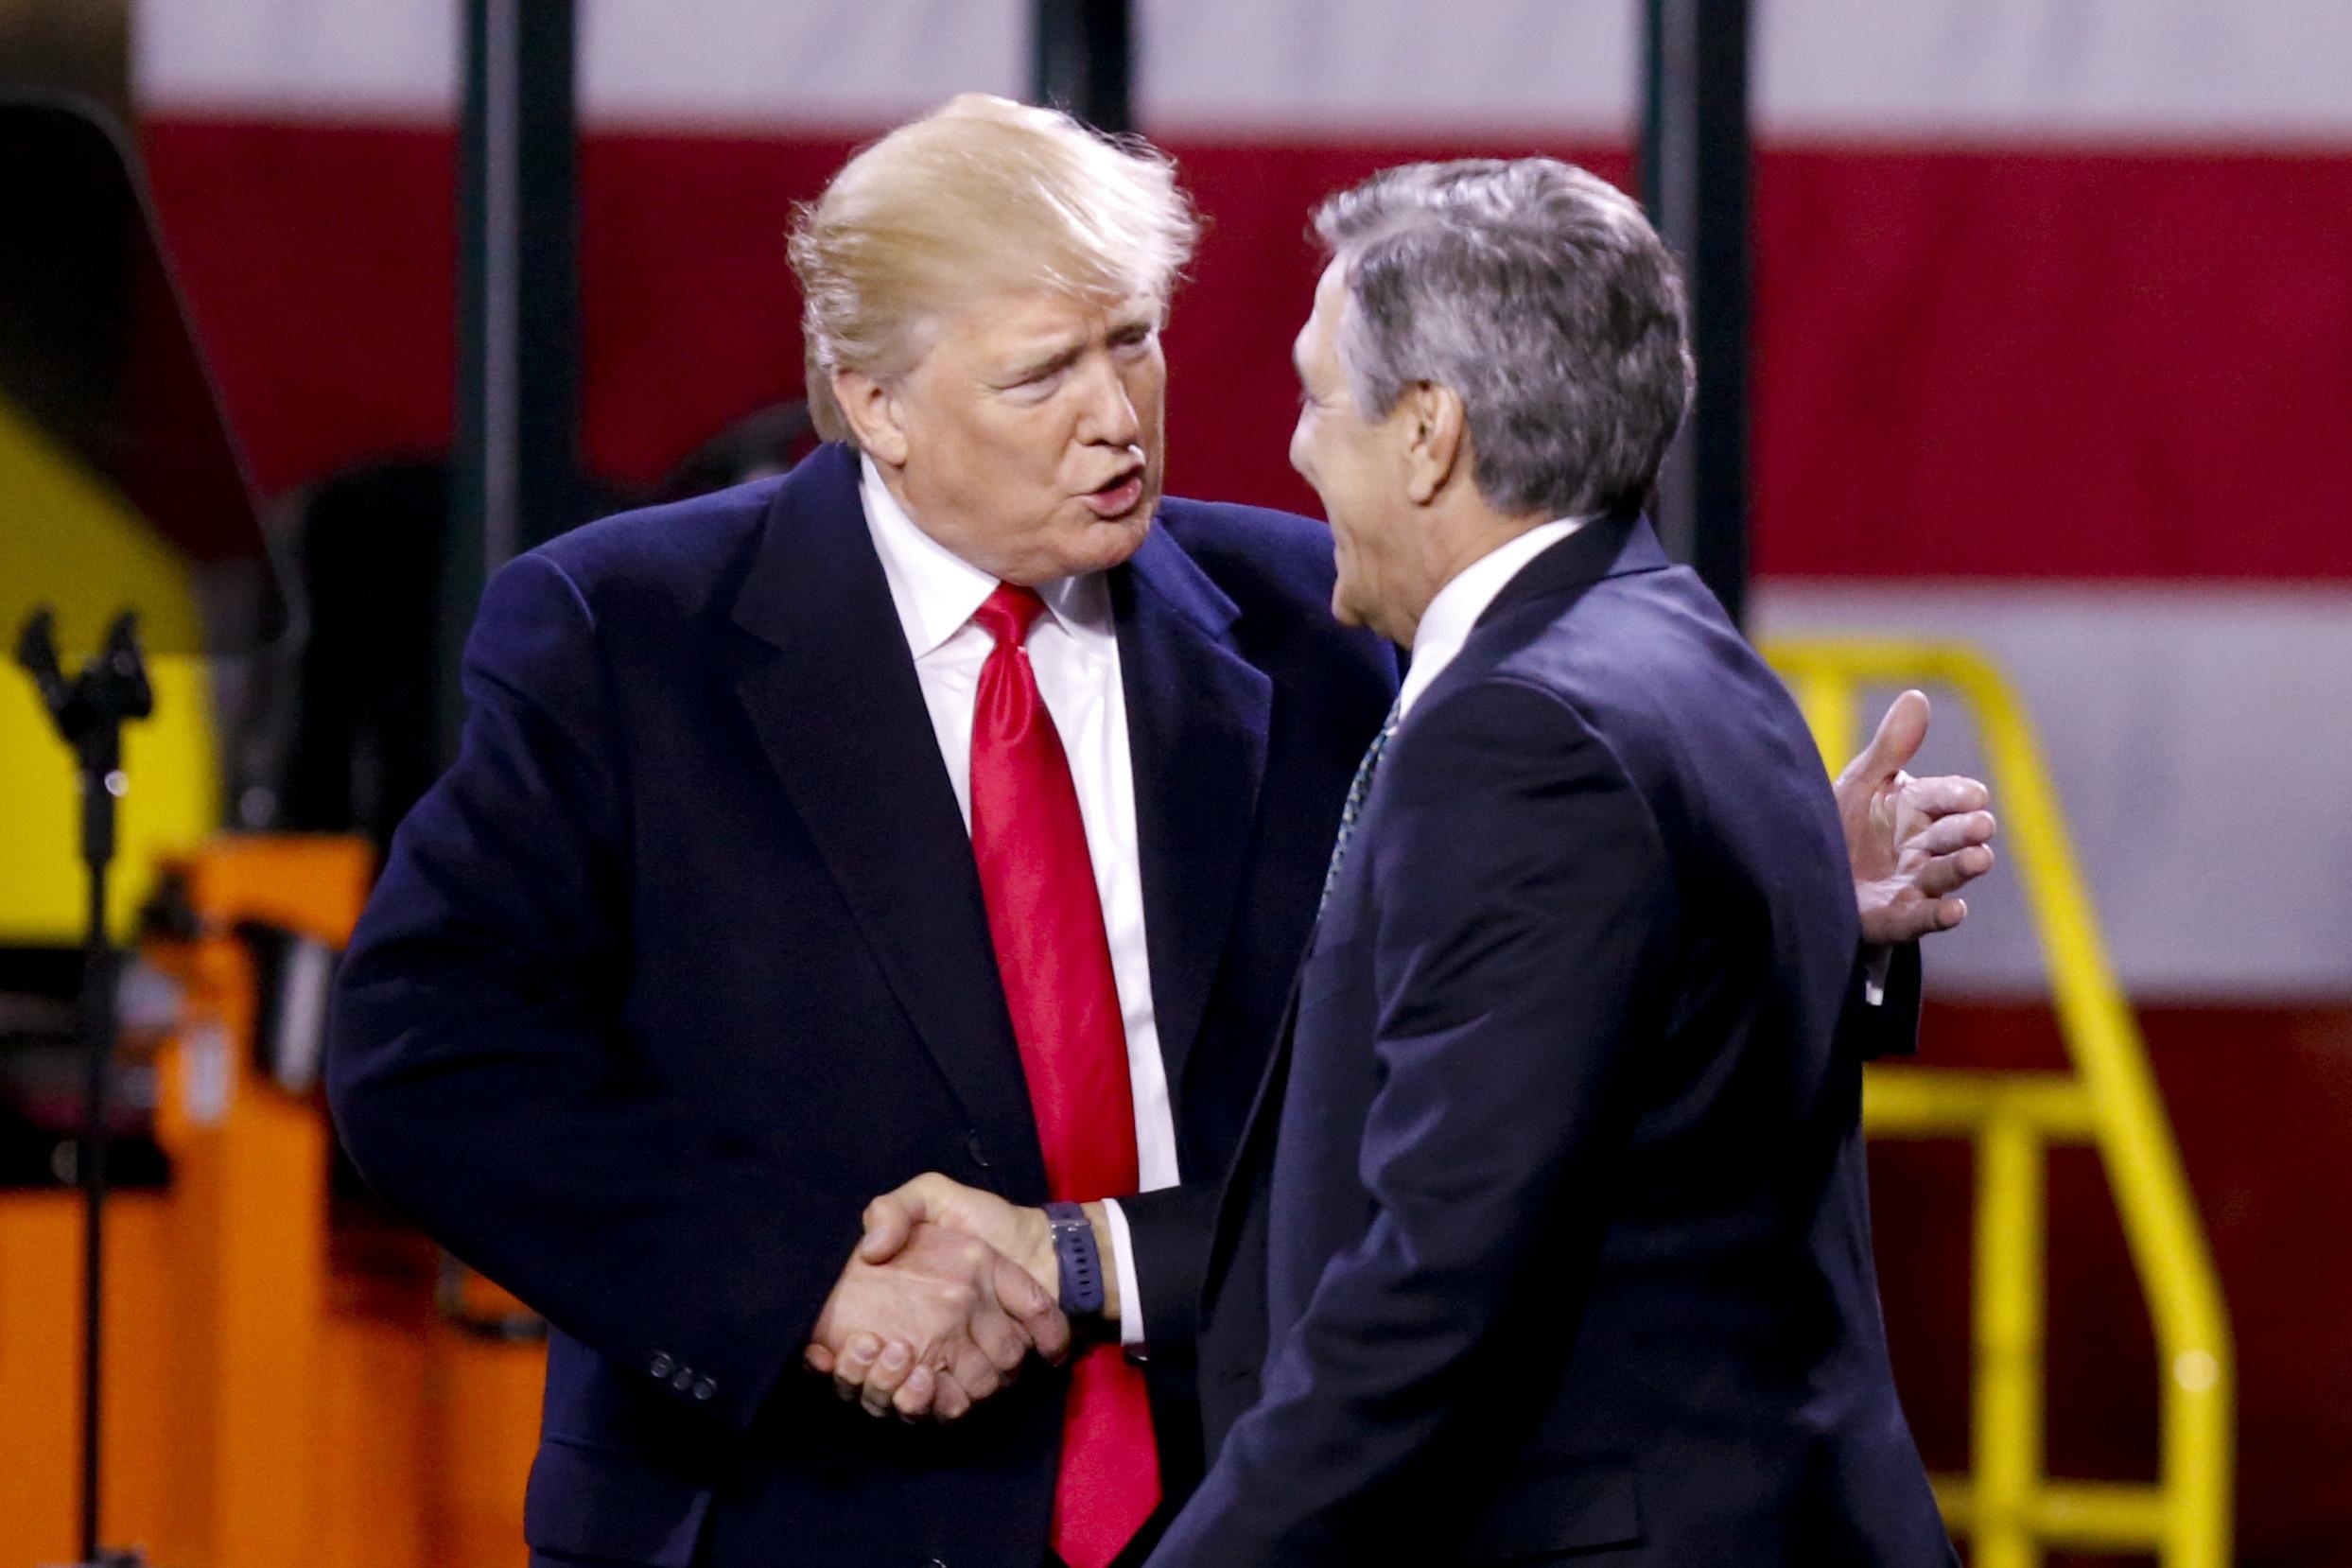 Rep. Lou Barletta and President Donald Trump